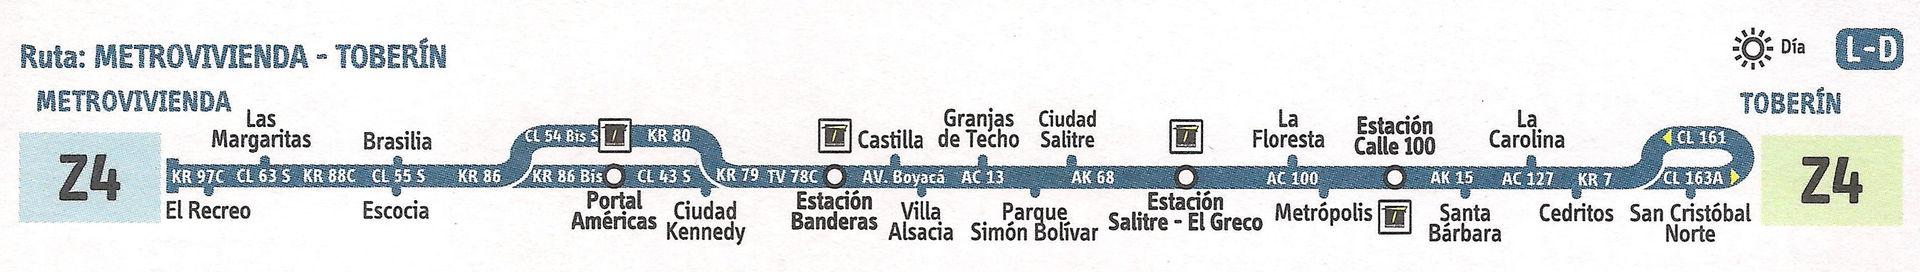 Ruta SITP: Z4 Toberín ↔ Metrovivienda [Urbana] 2